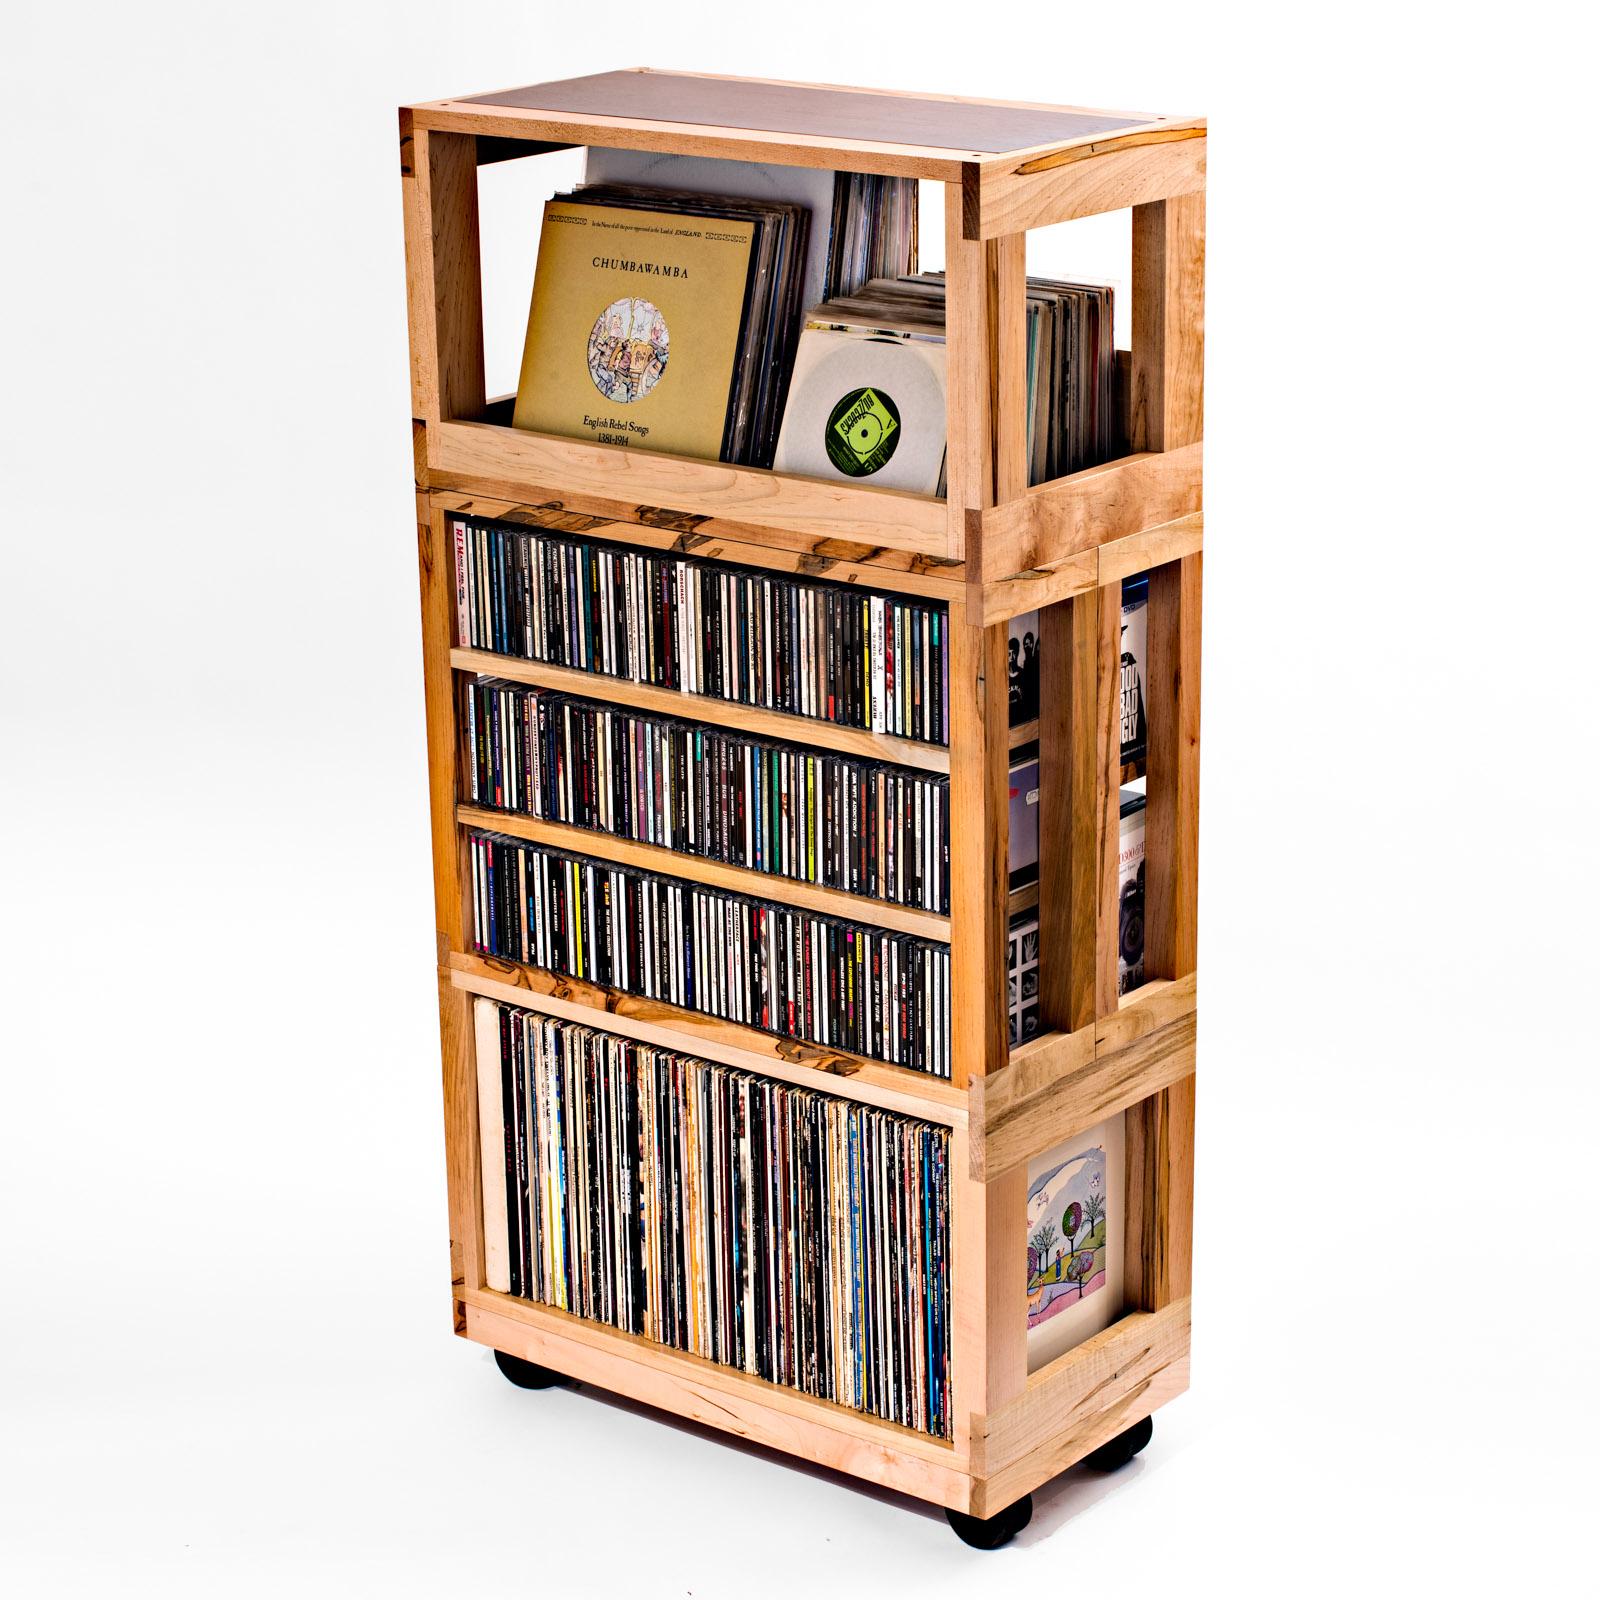 Ambrosia maple modular furniture